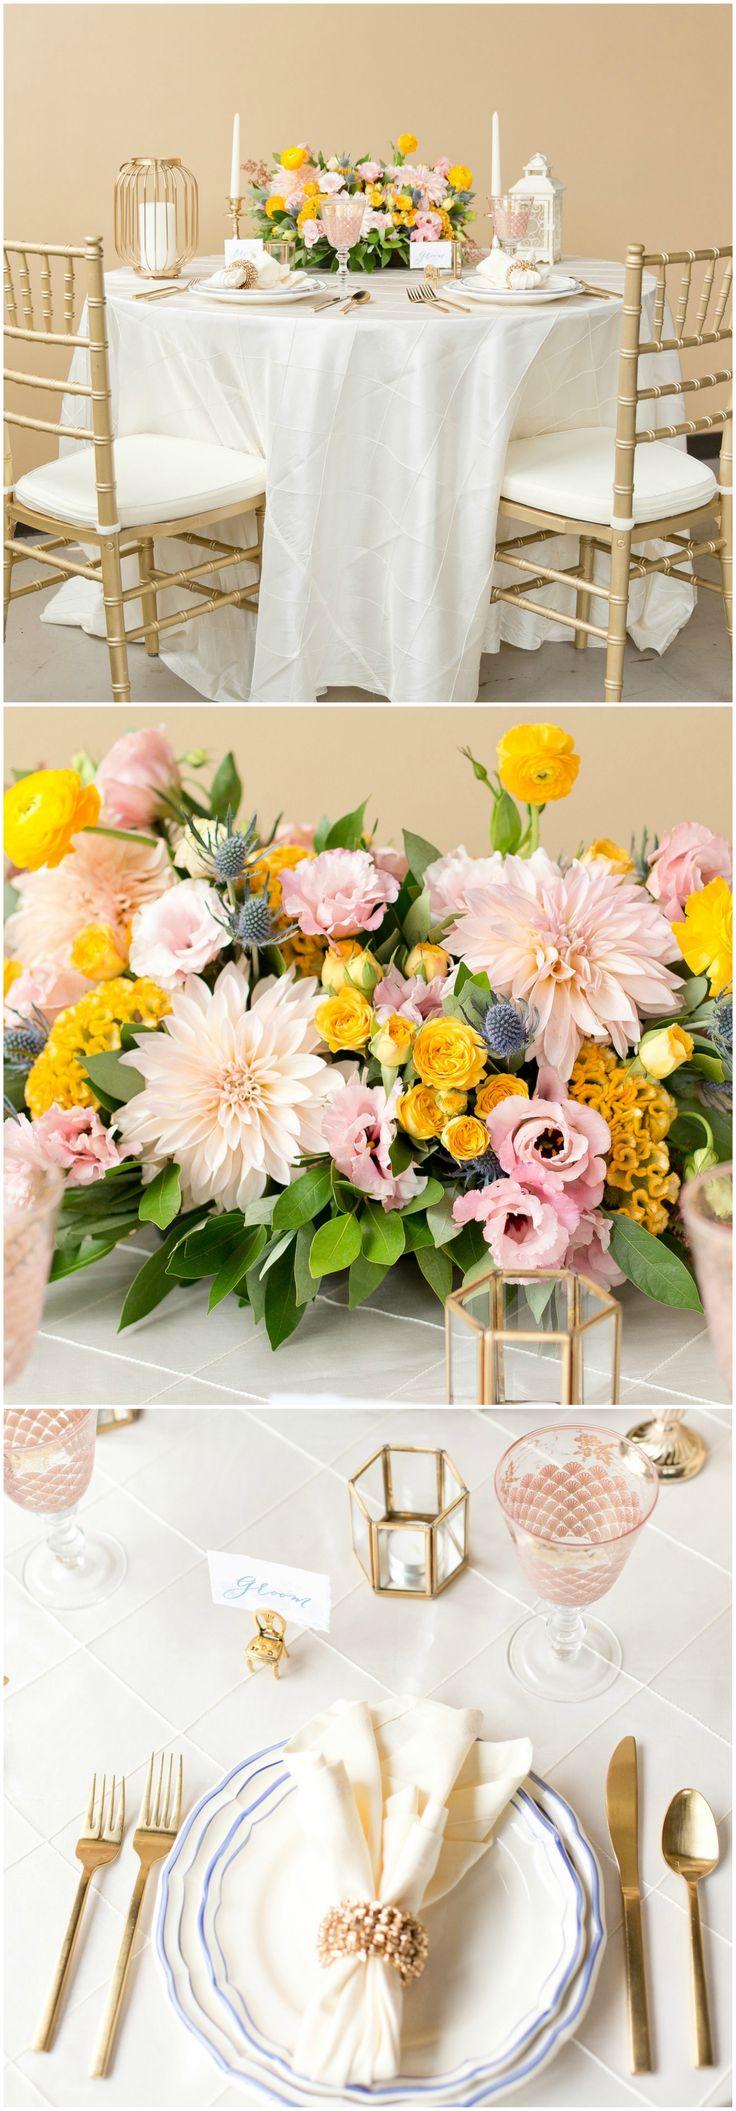 Gold wedding design, chiavari chairs, gold coral napkin ring, pink dahlia & orange ranunculus floral centerpiece, updated chic // Erica and Jon Photography